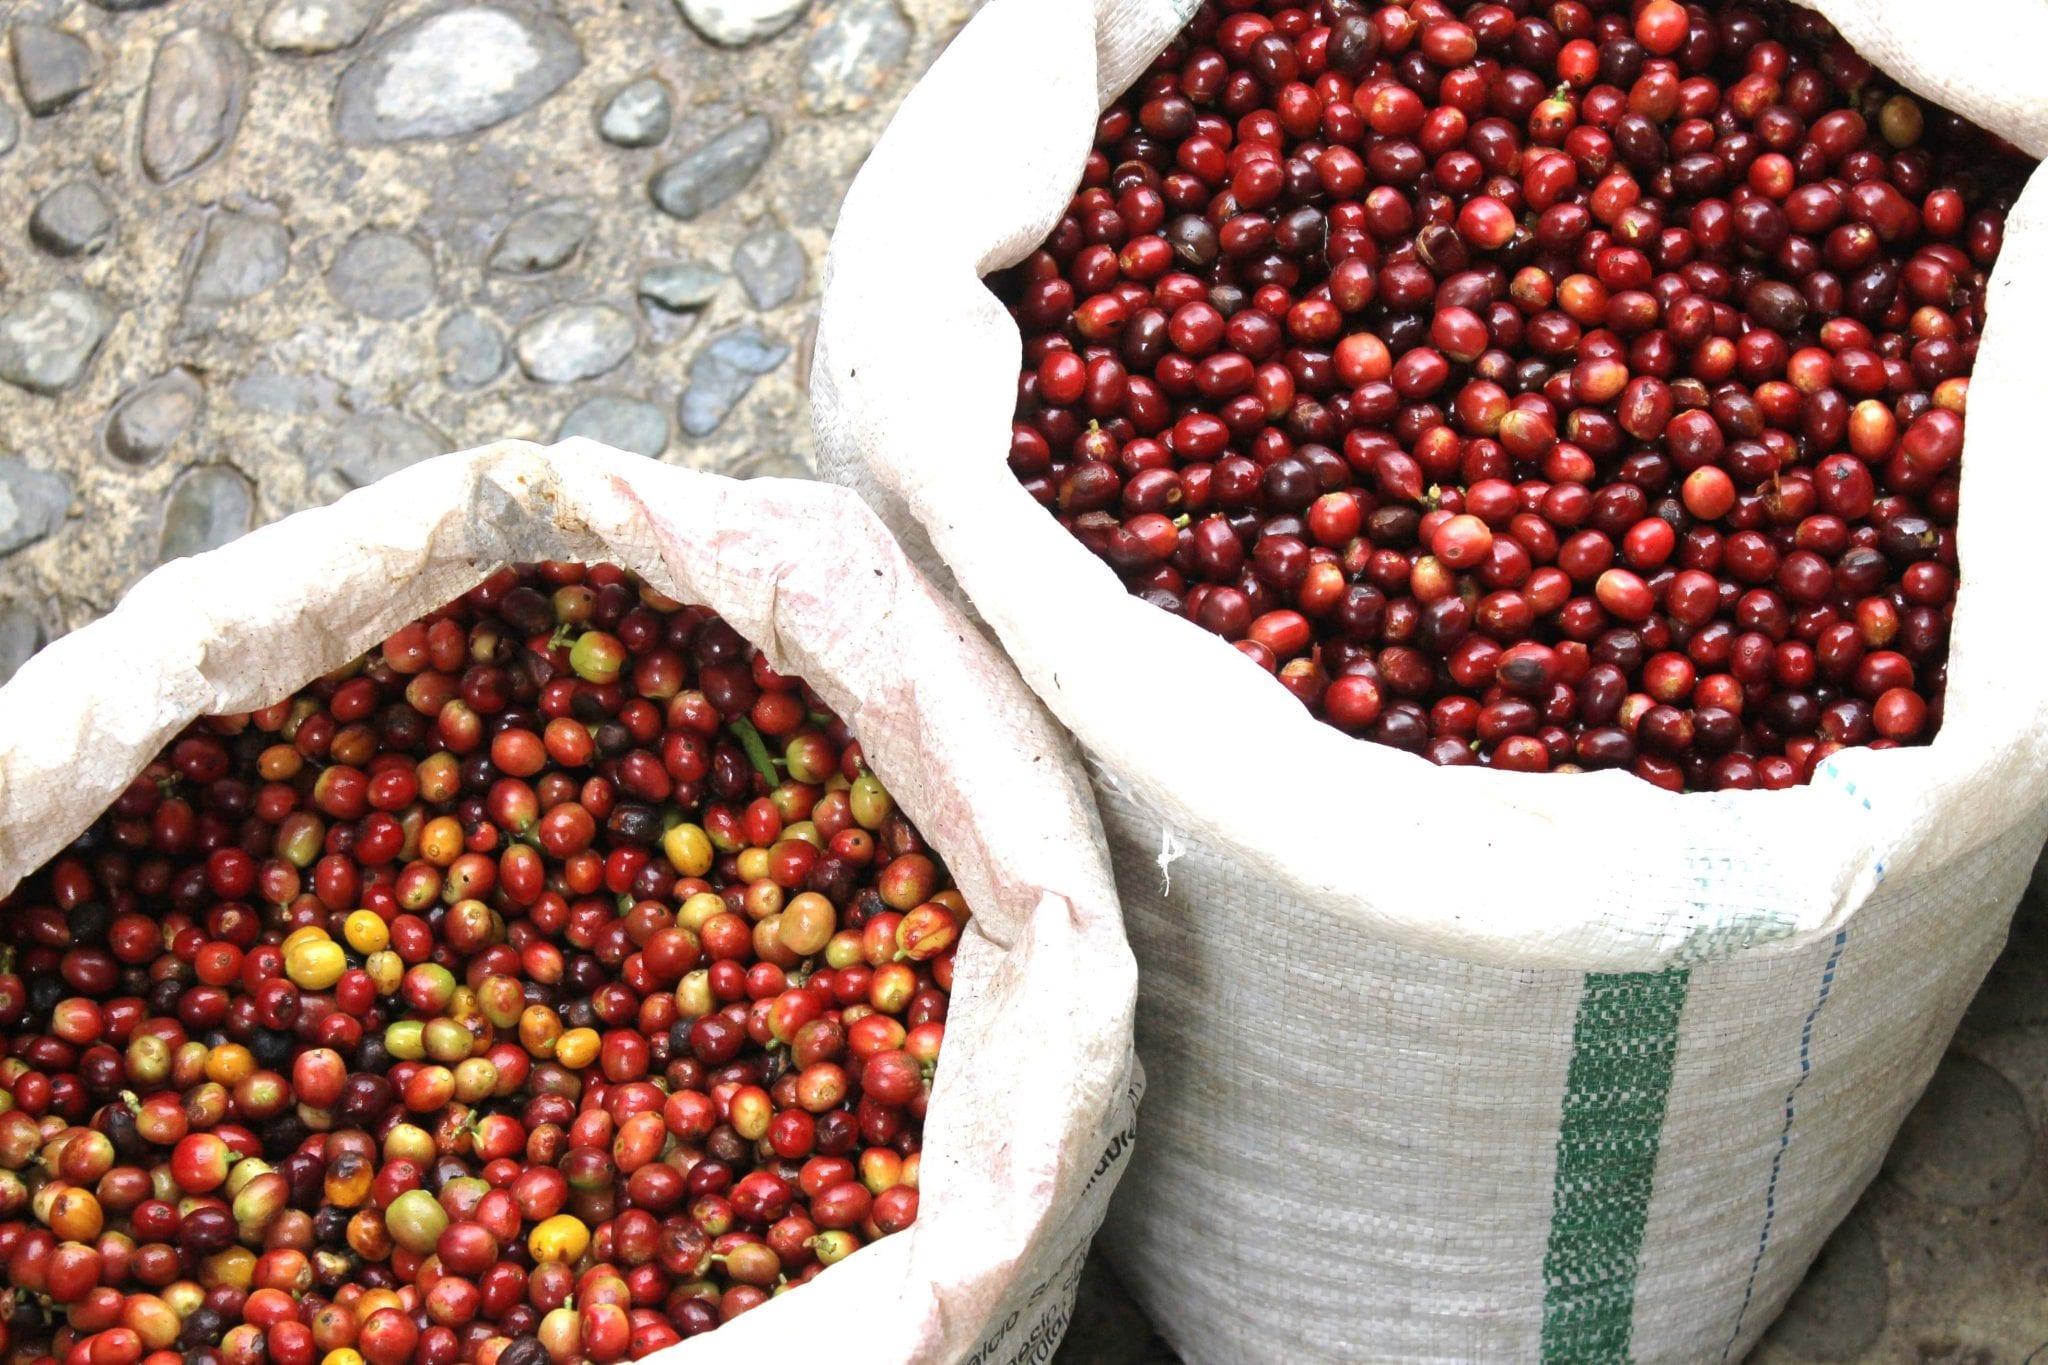 two sacks of coffee cherries